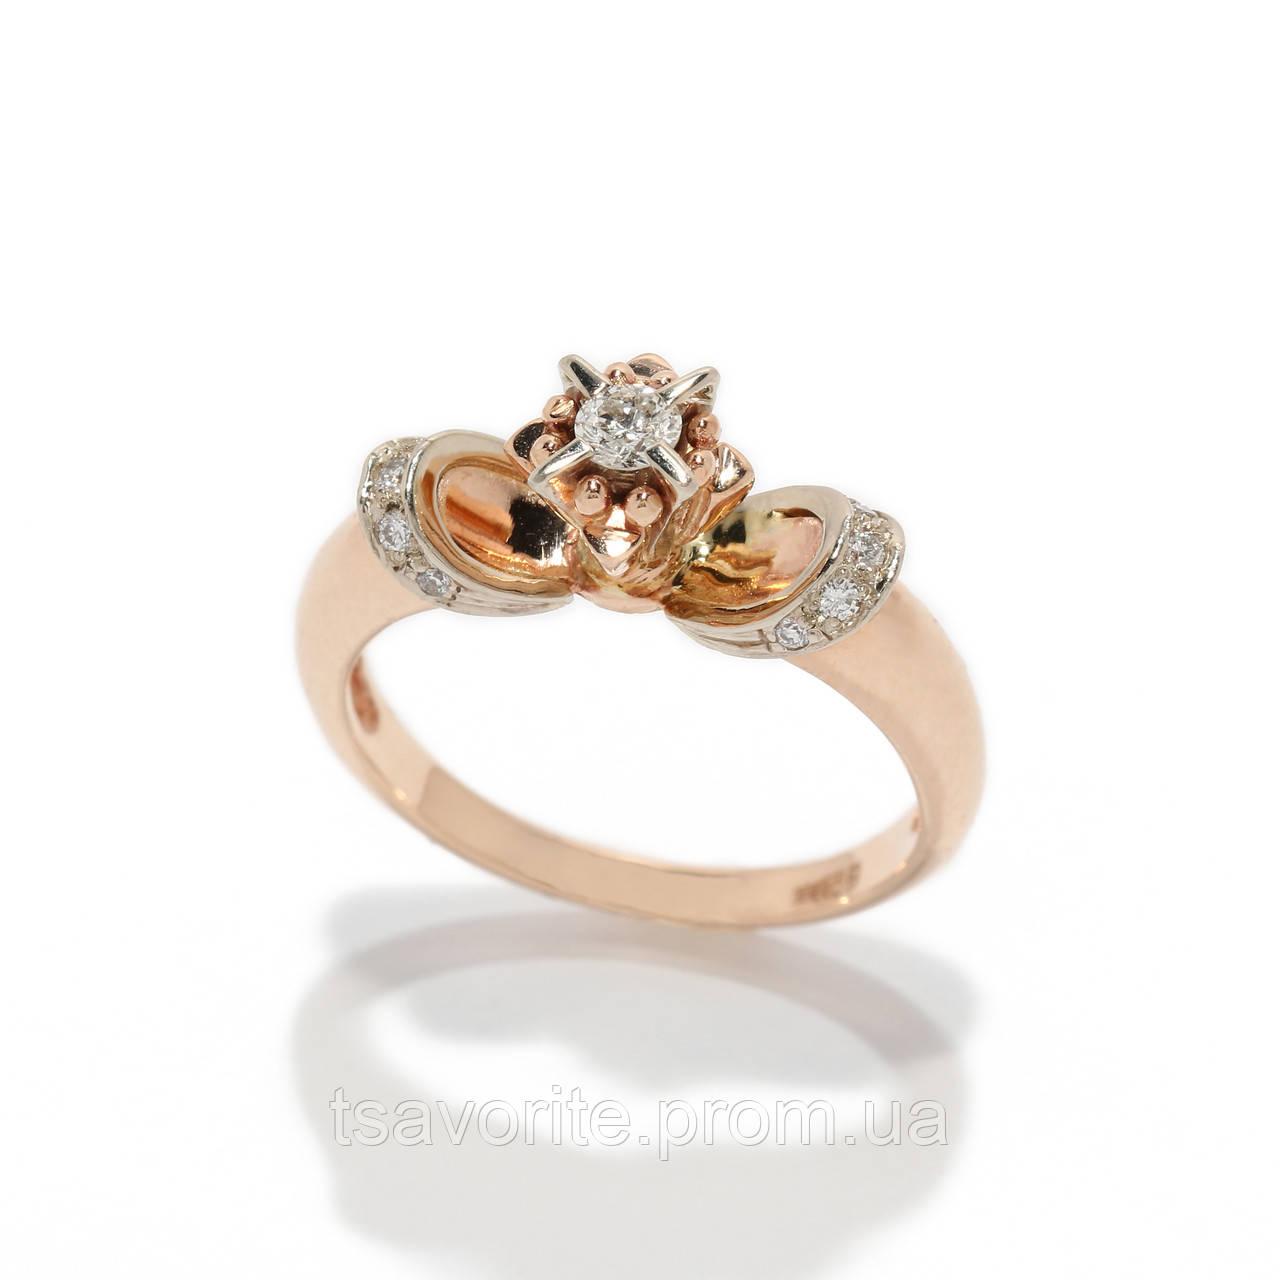 Золотое кольцо с бриллиантами 2231595